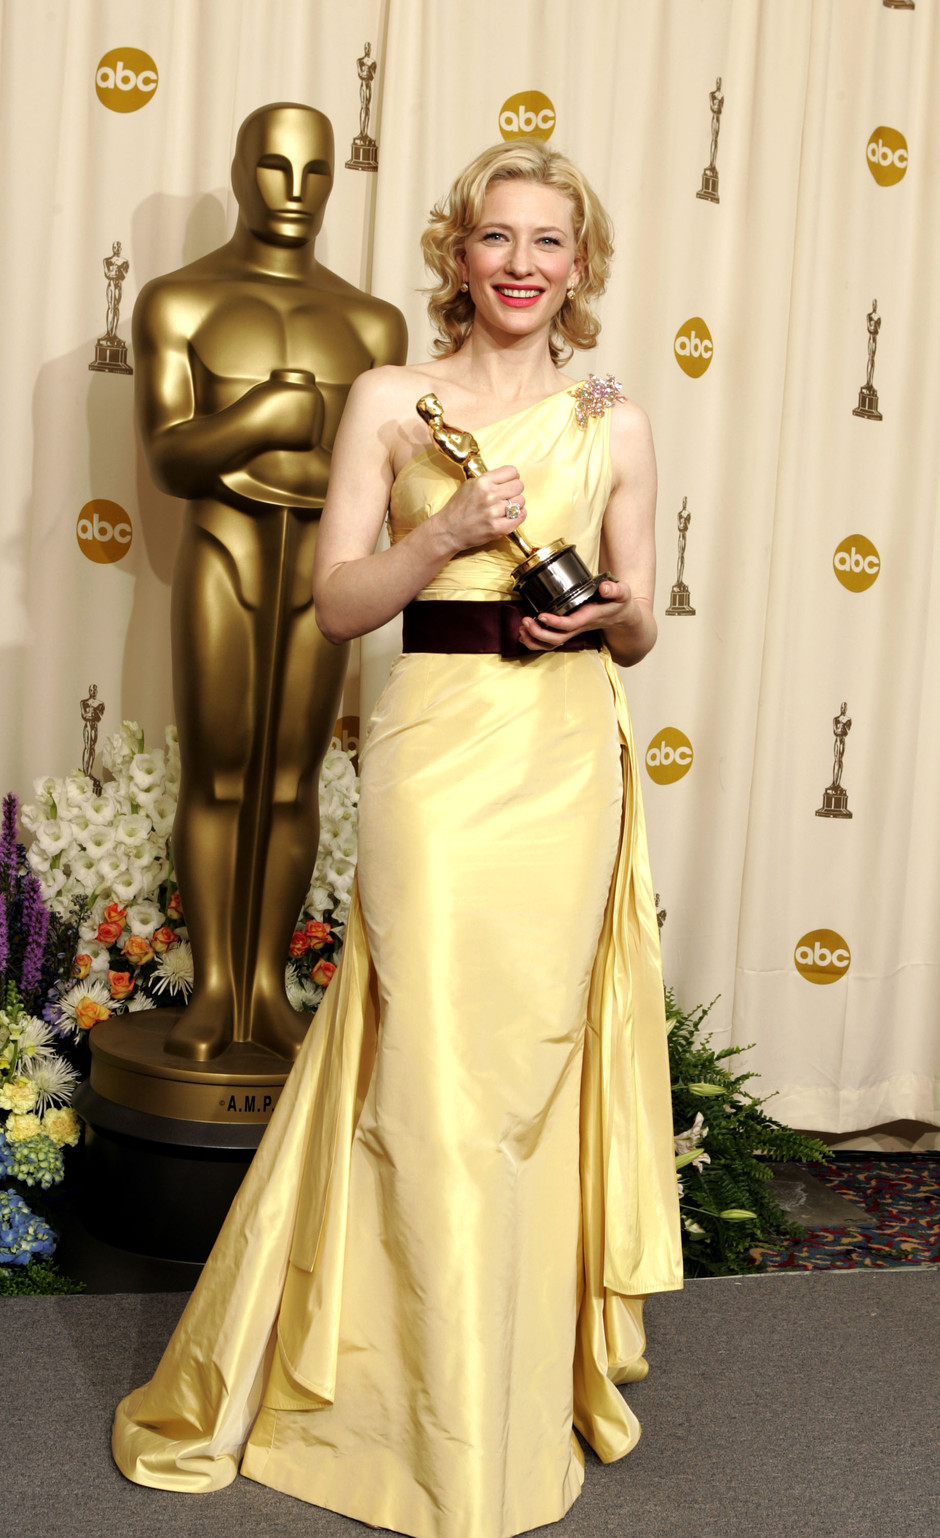 Кейт Бланшетт на церемонии вручения кинонаград «Оскар», 2005 год